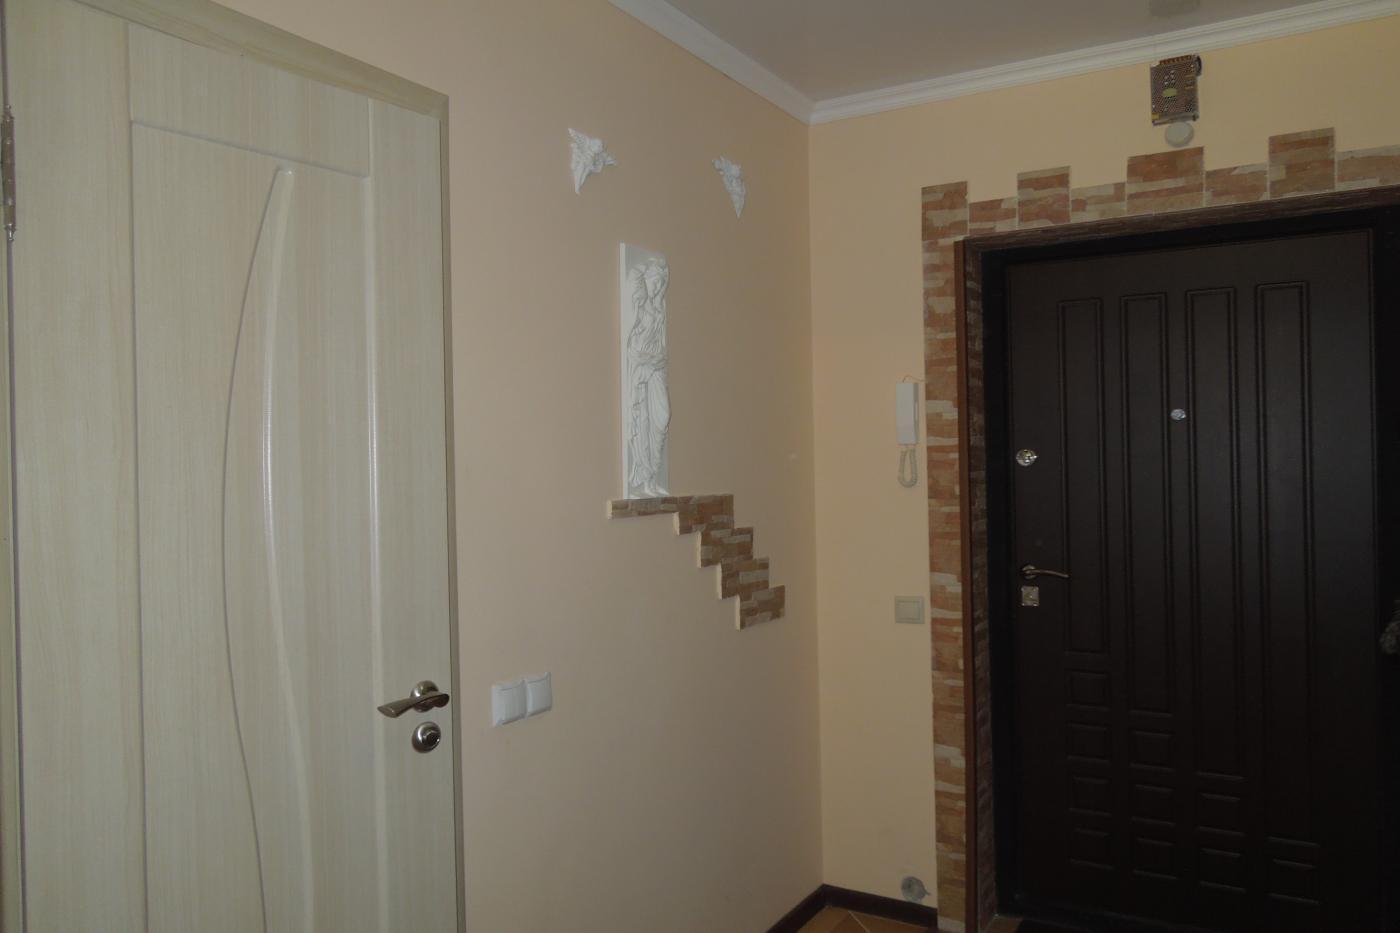 1-комнатная квартира посуточно (вариант № 1932), ул. Челюскинцев улица, фото № 5